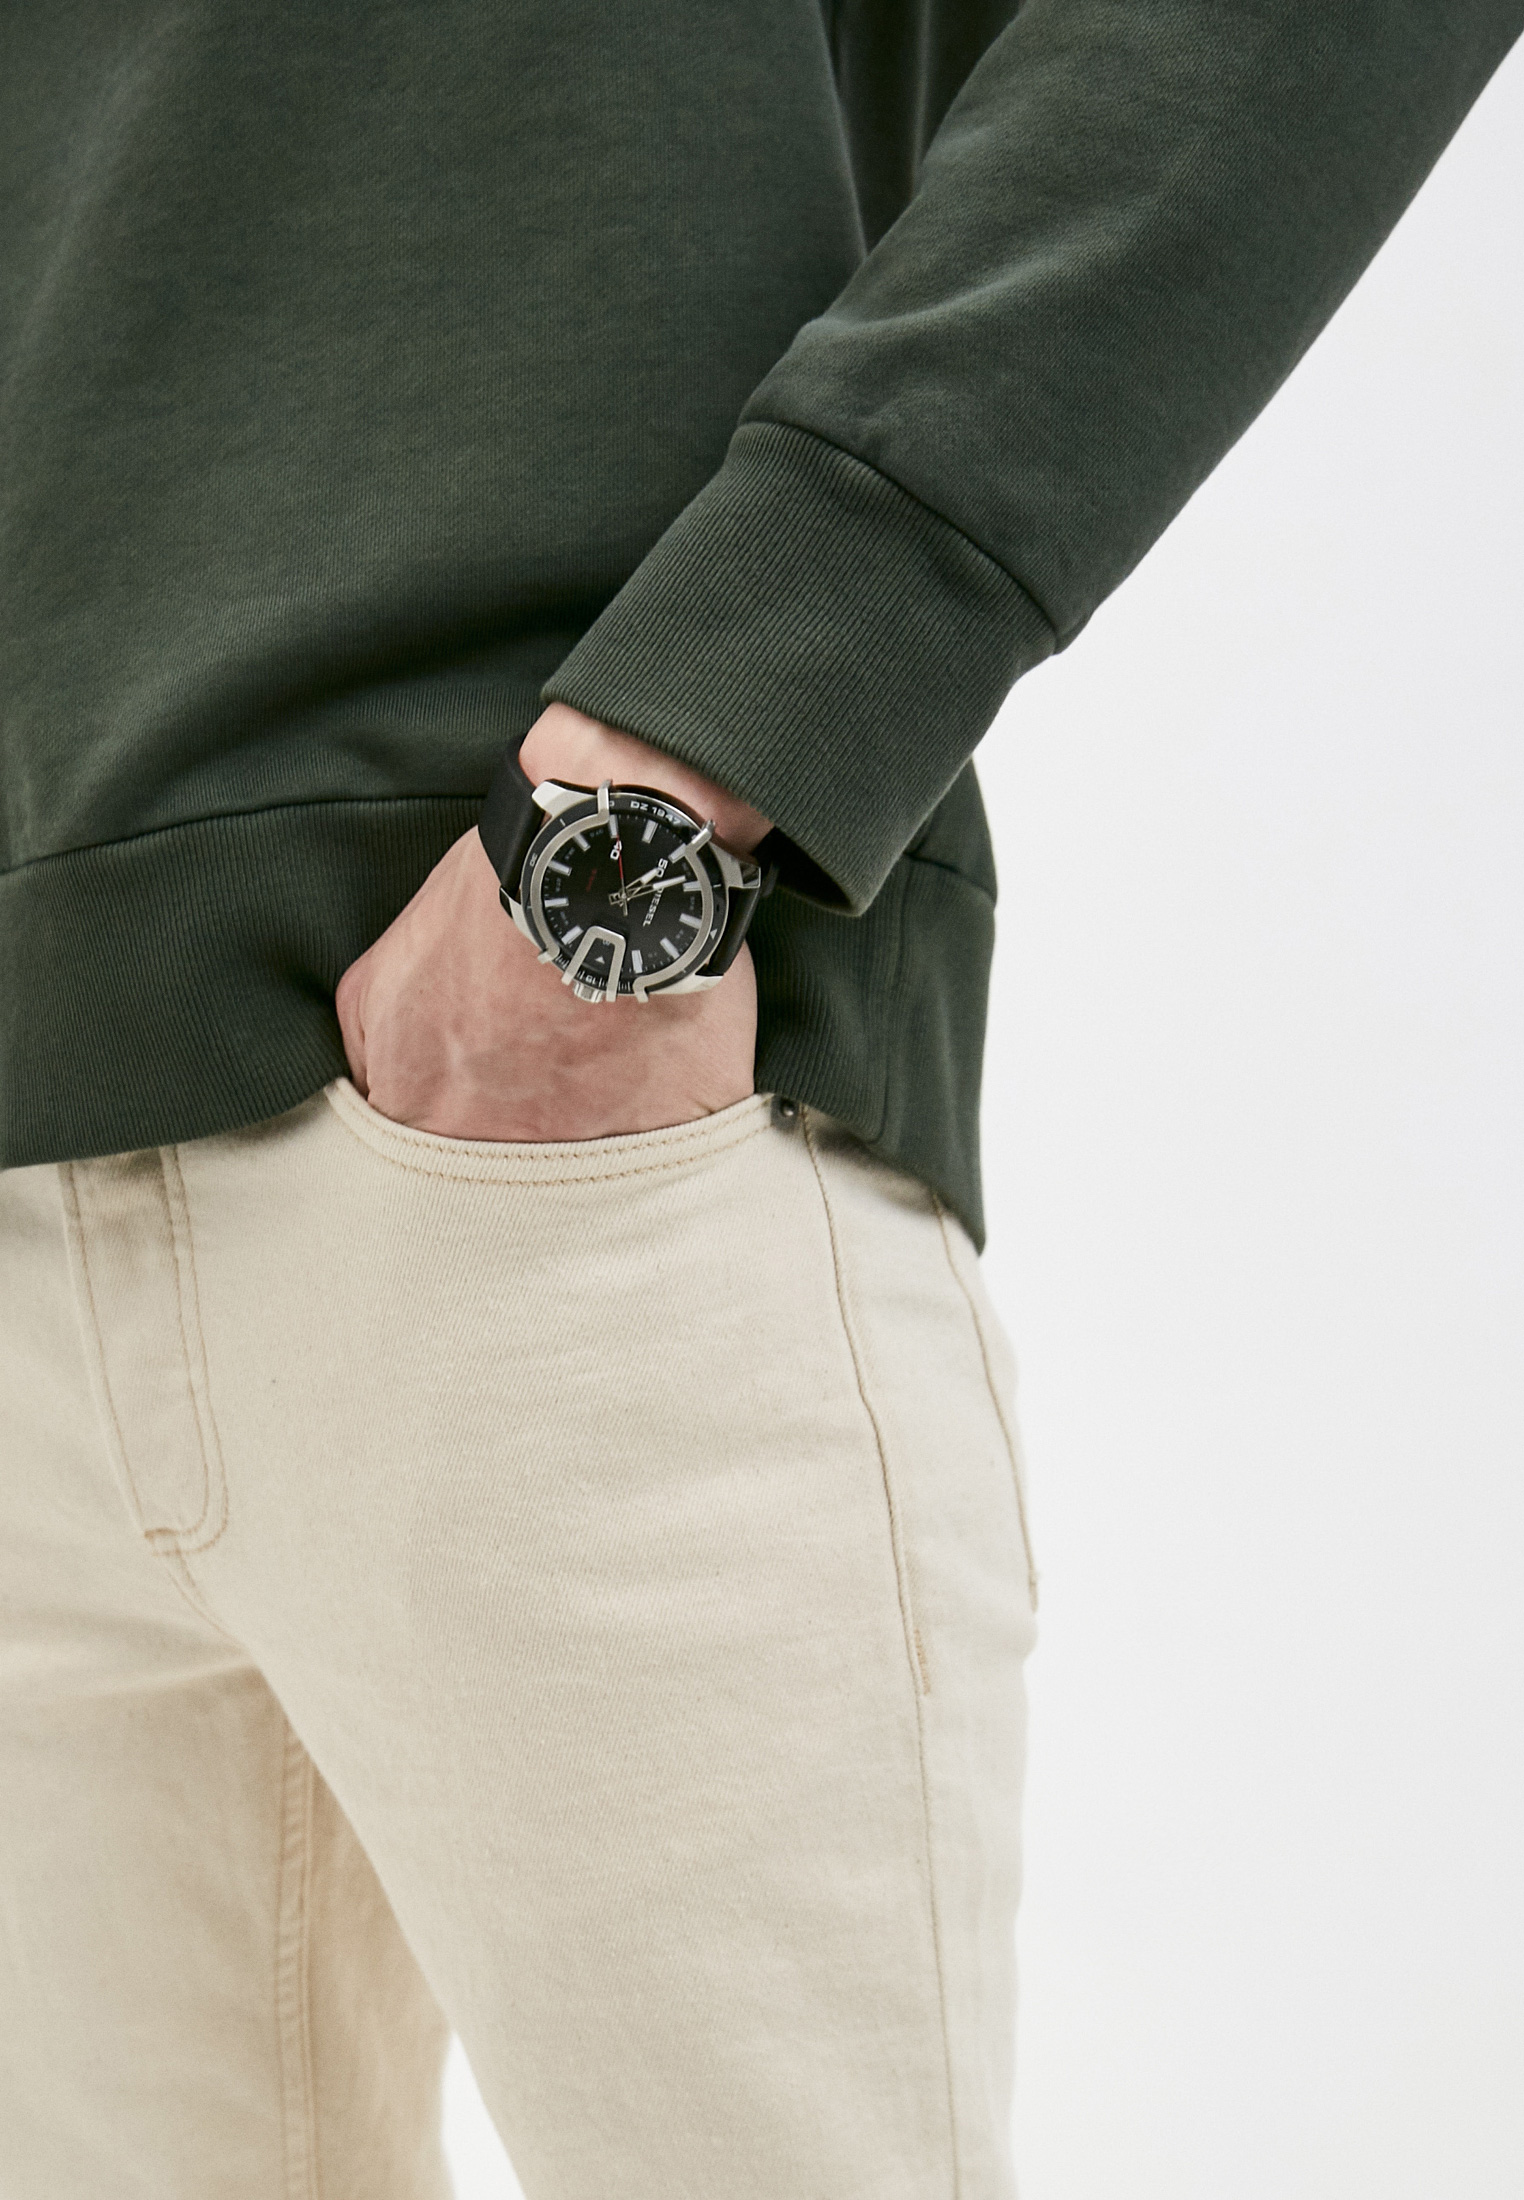 Мужские часы Diesel (Дизель) DZ1947